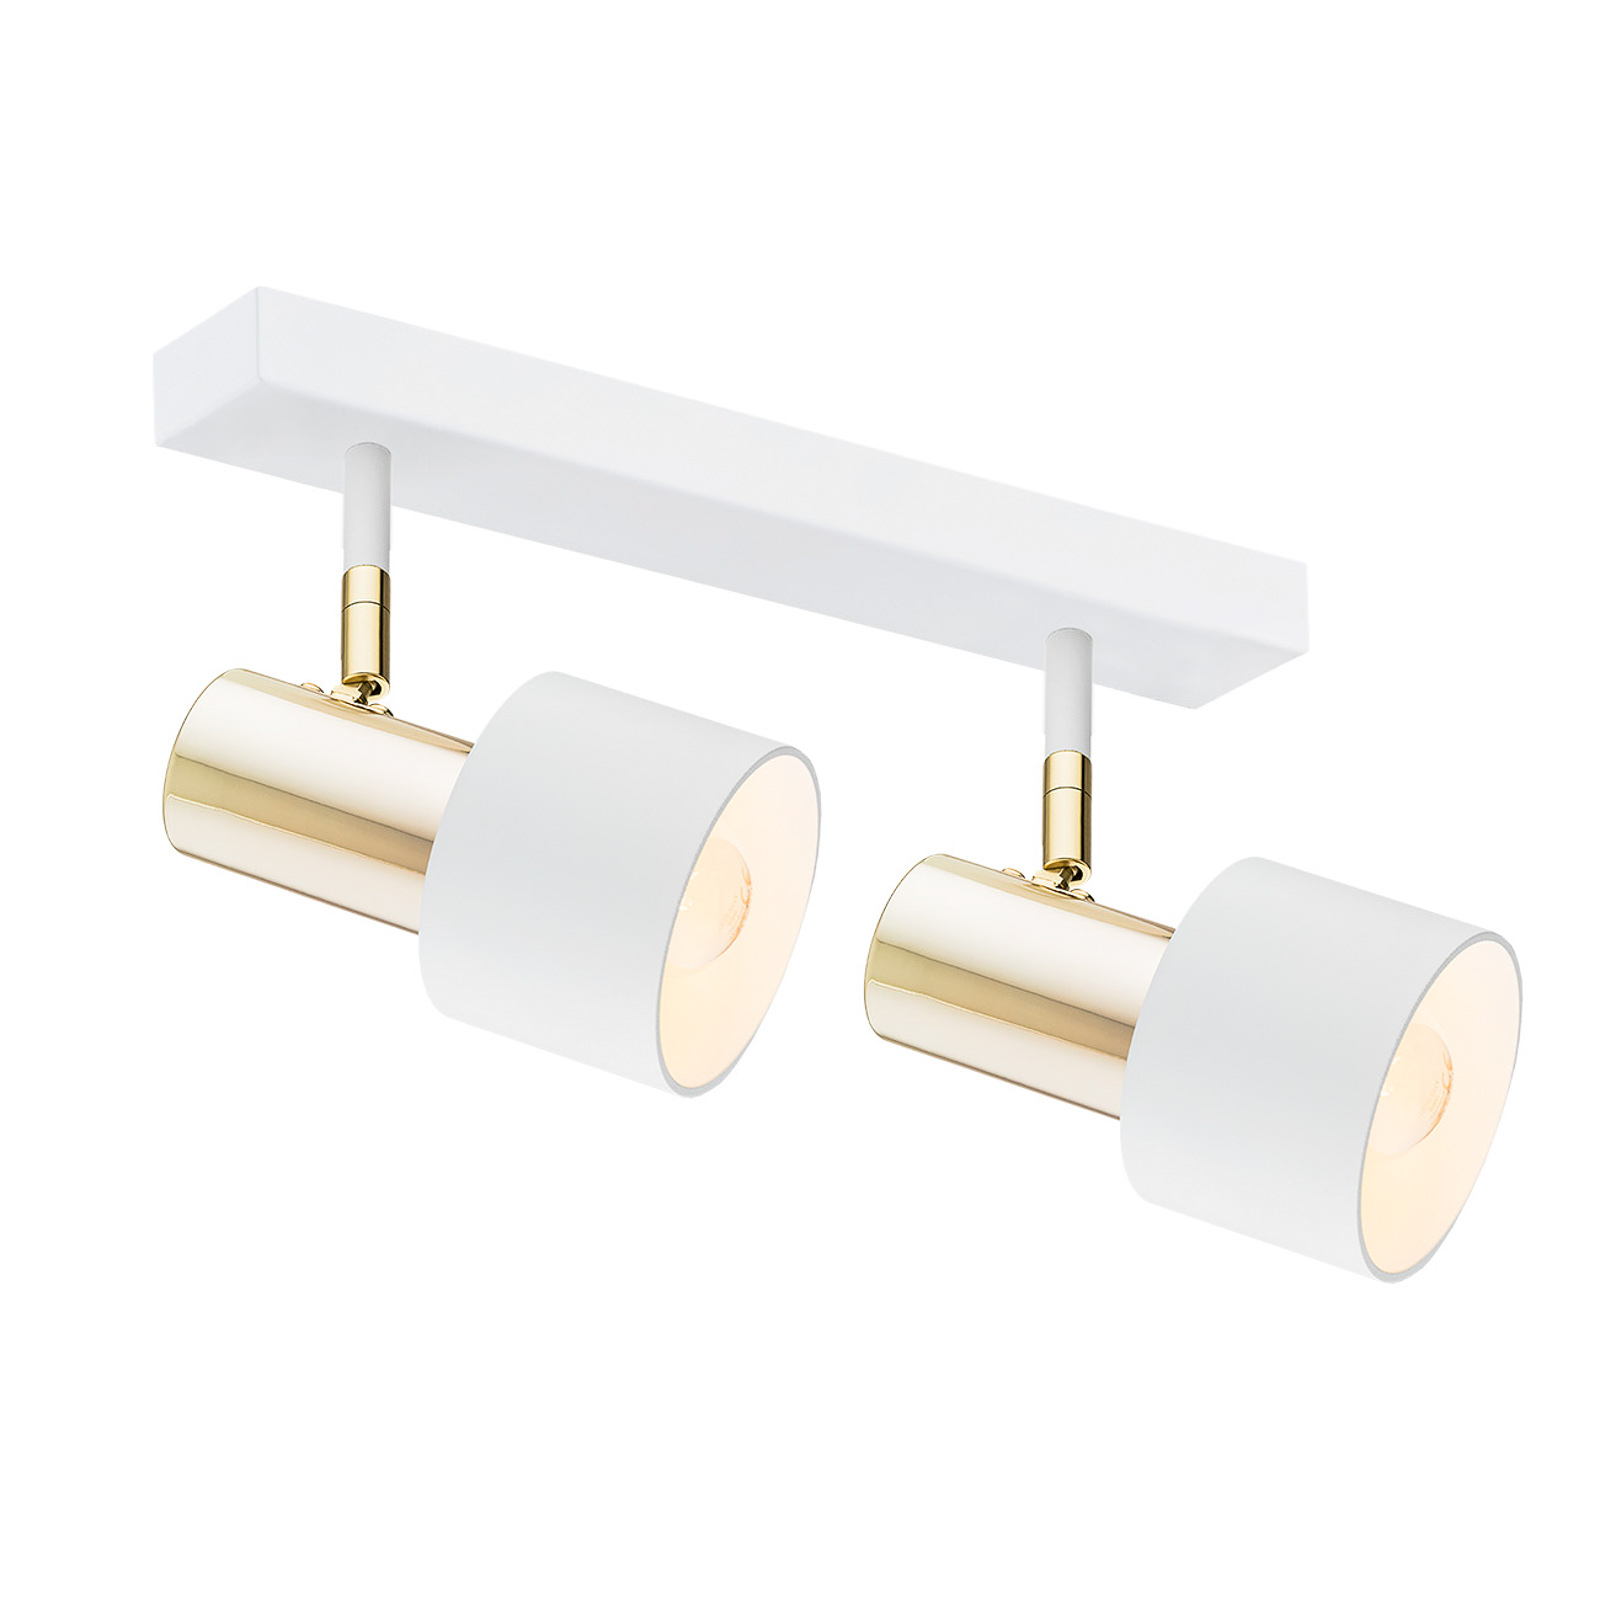 Destin loftspot, 2 lyskilder, hvidt/messing